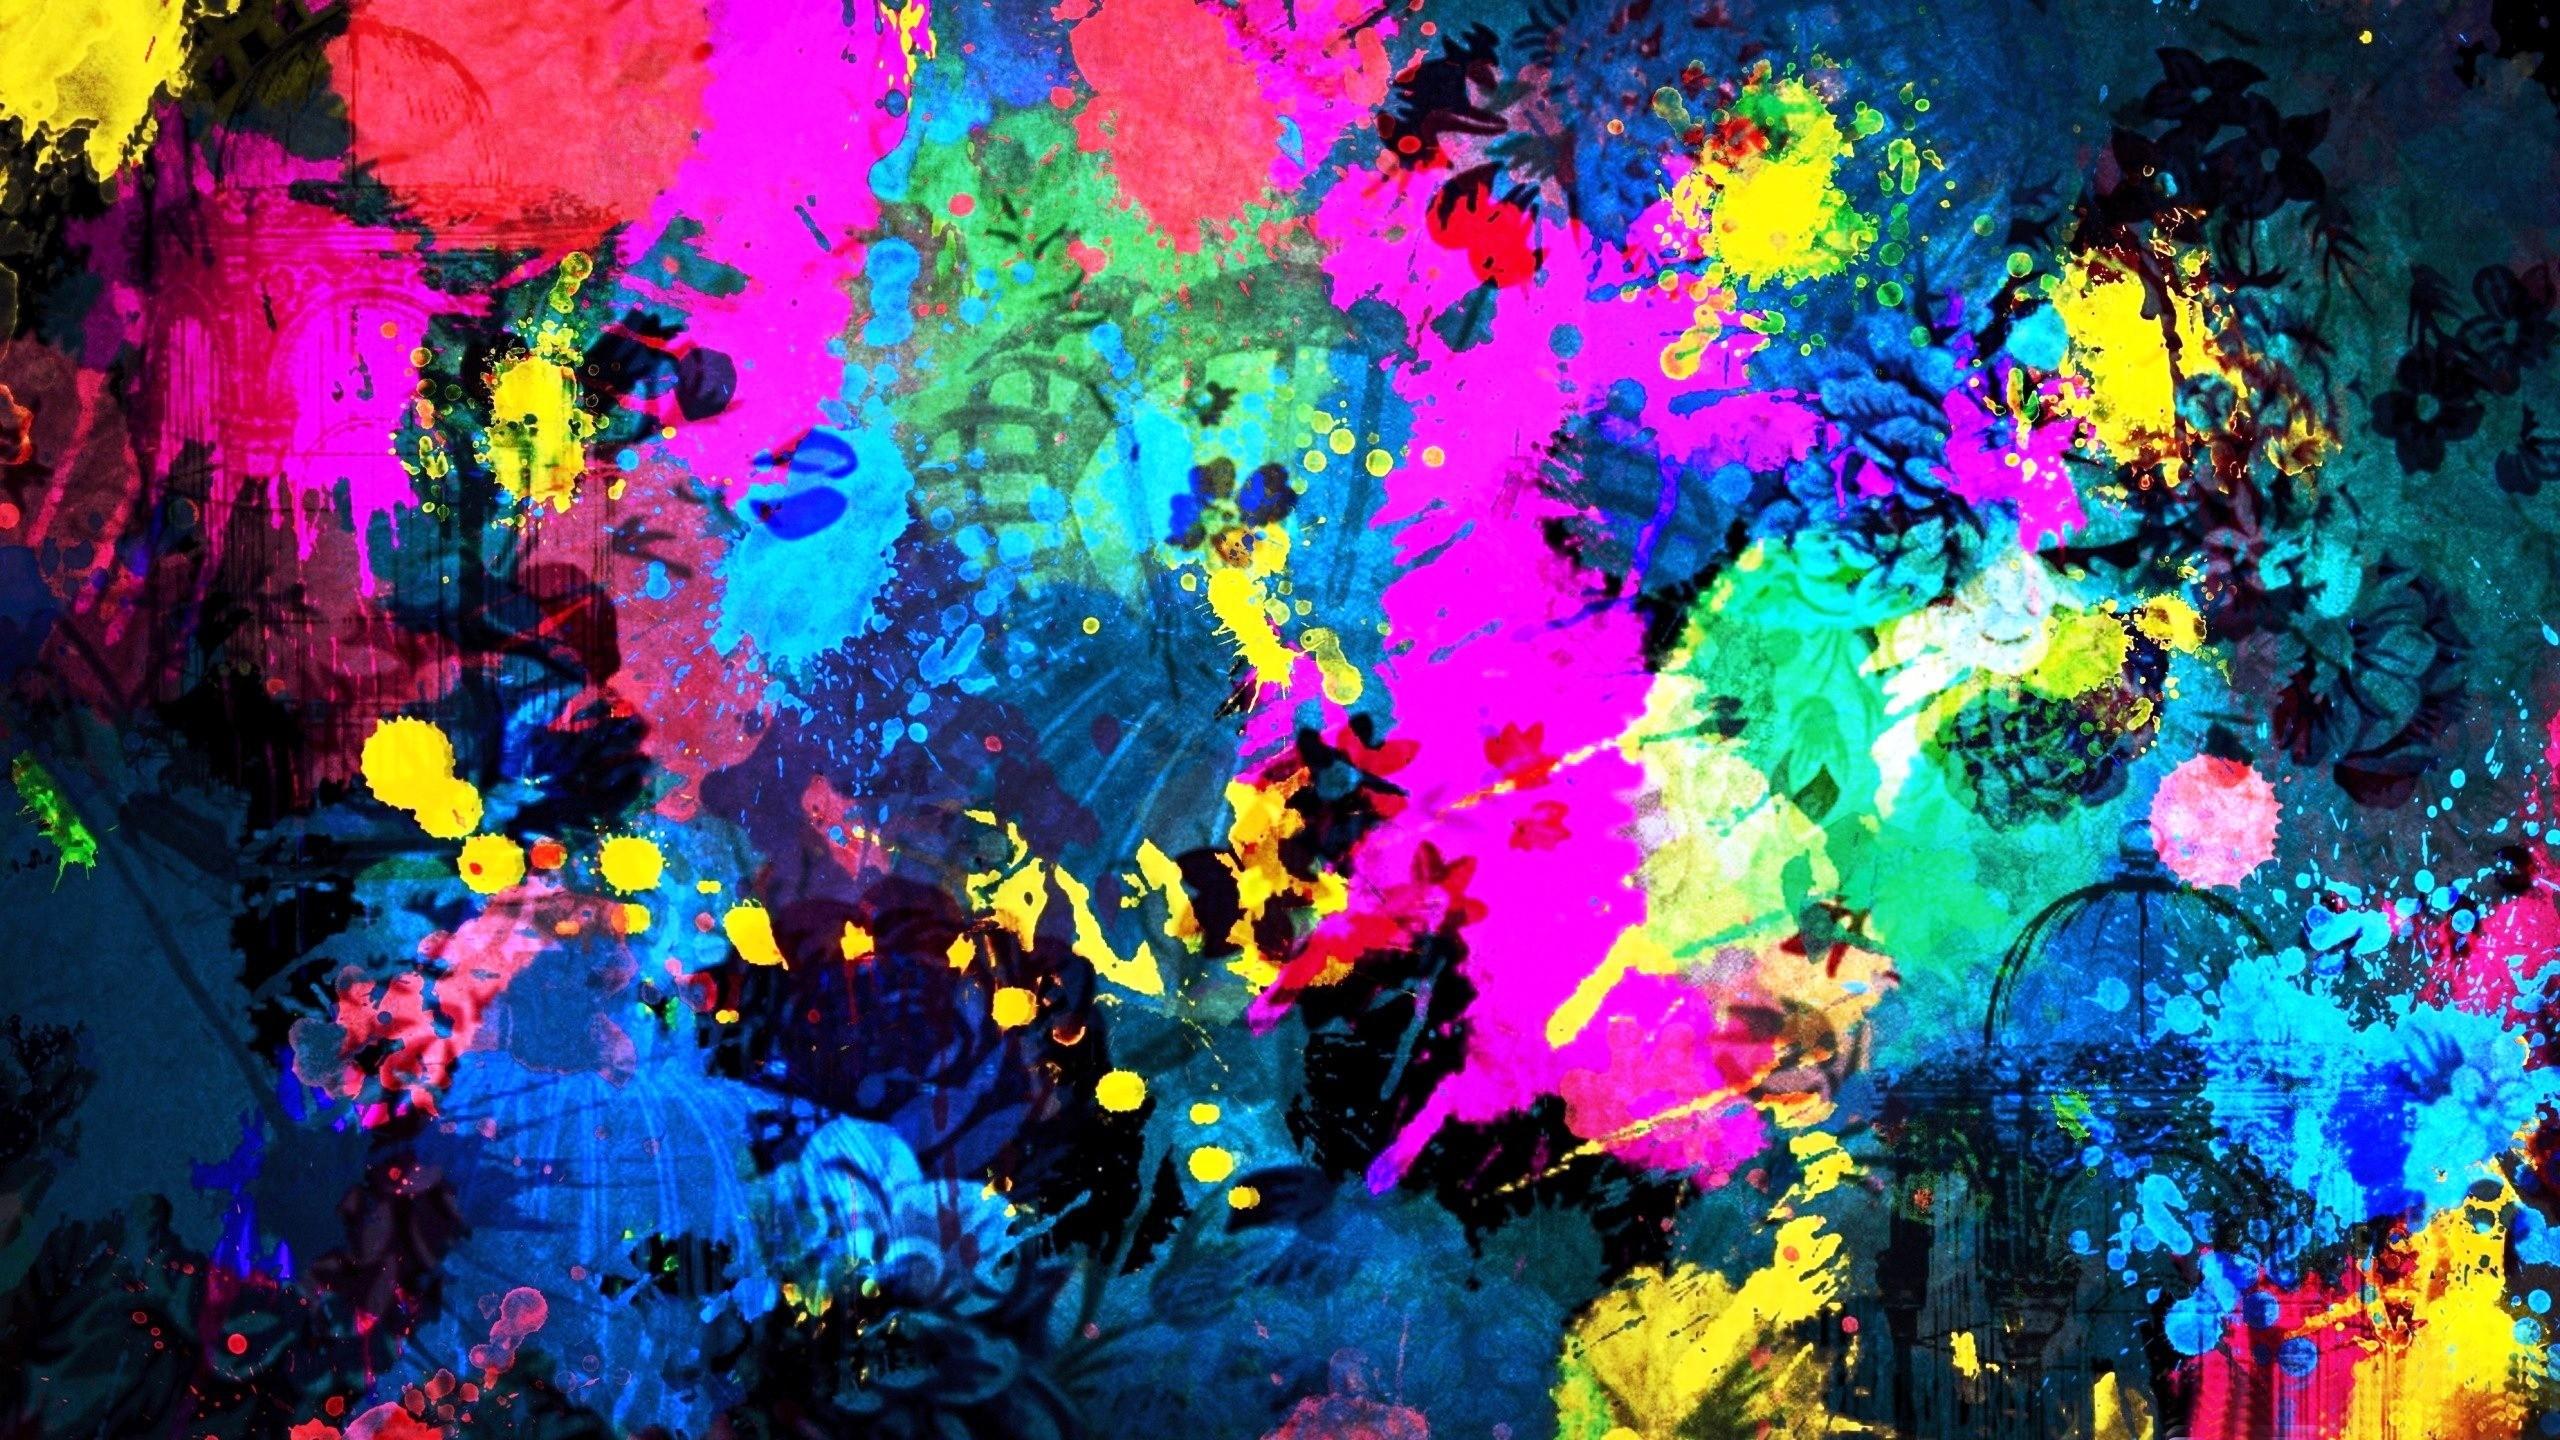 Abstract Art Wallpaper Hd 2853 Full HD Wallpaper Desktop - Res